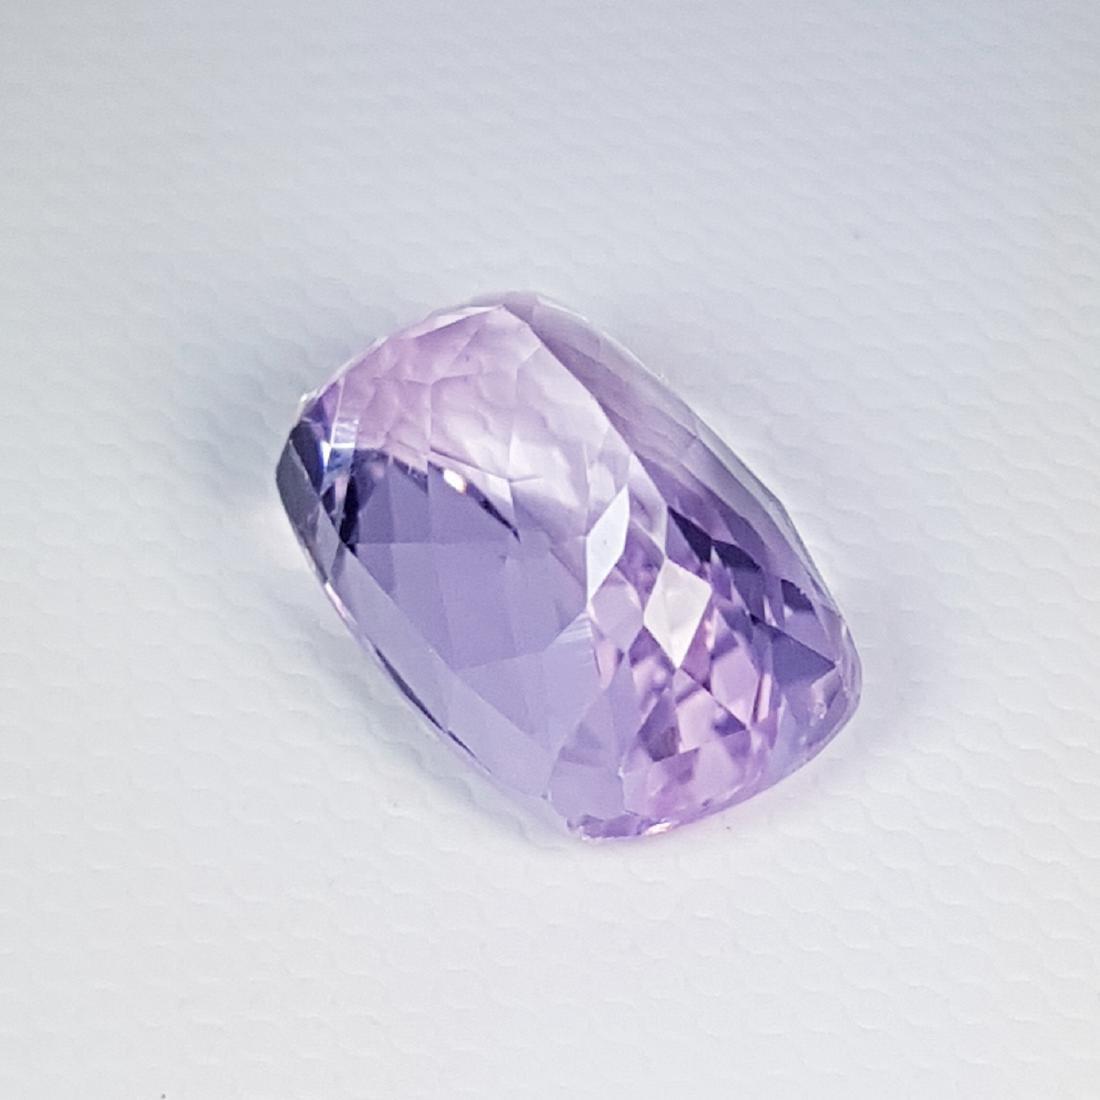 Rare & Lovely Gem Natural Pink Kunzite - 9.82 ct - 3